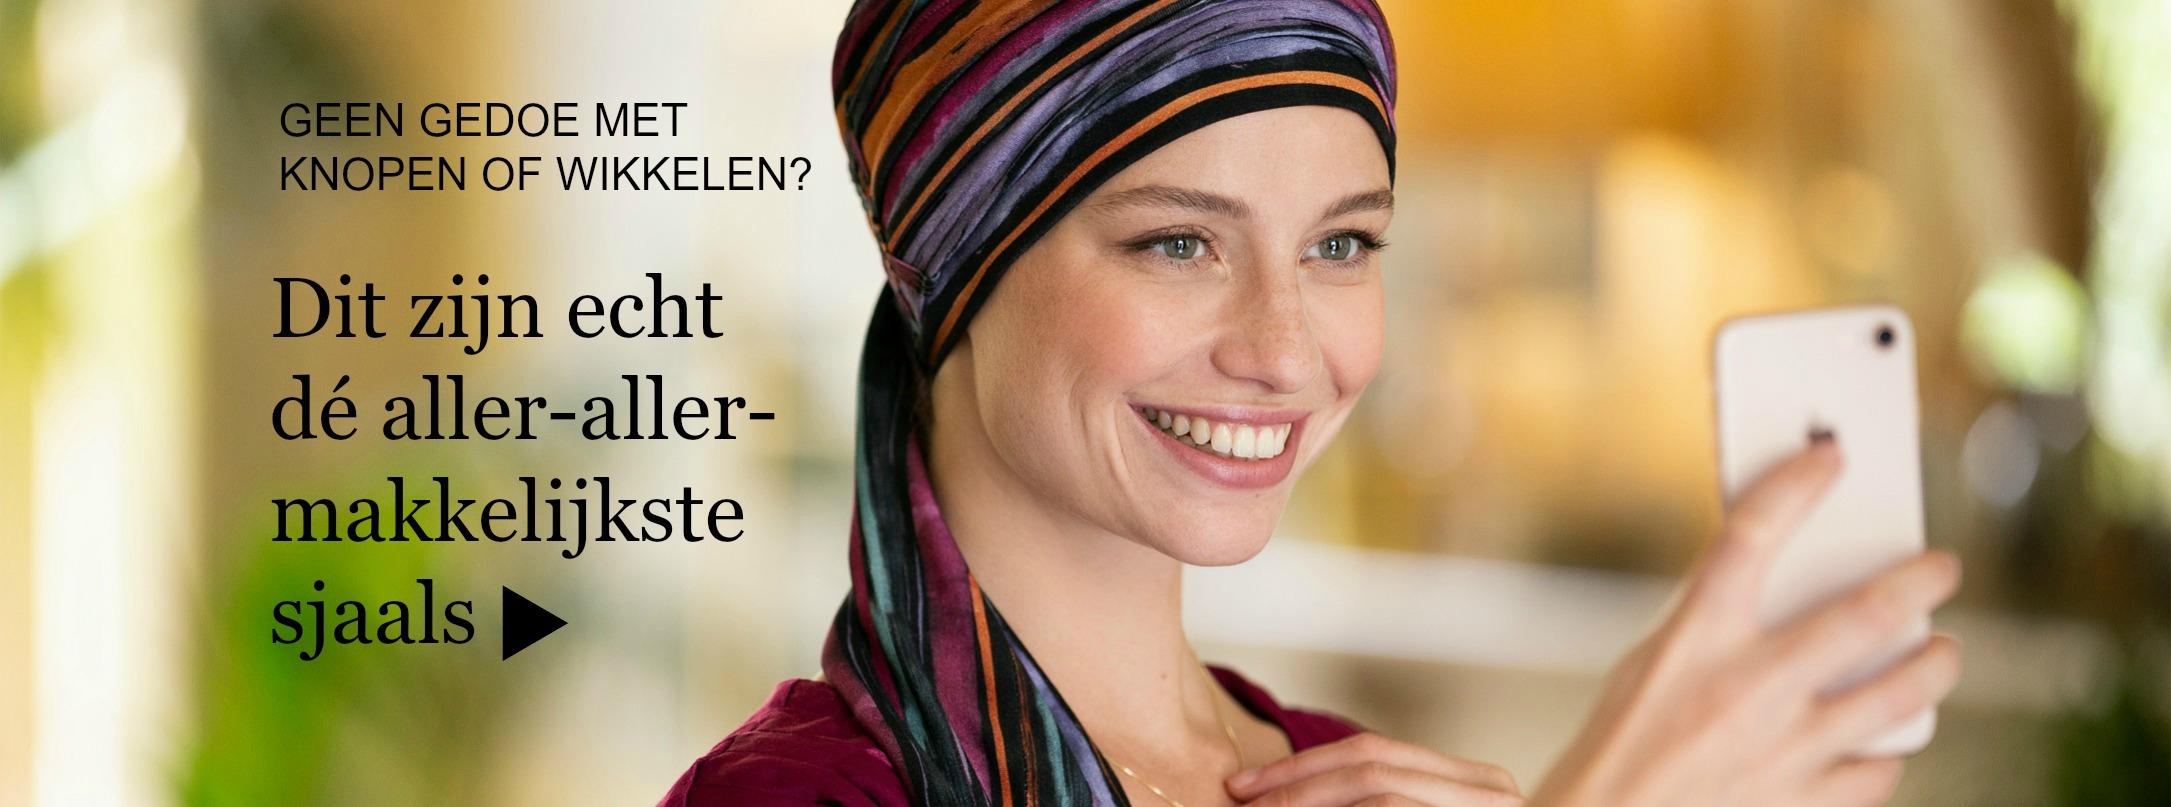 chemo sjaals na kanker of alopecia